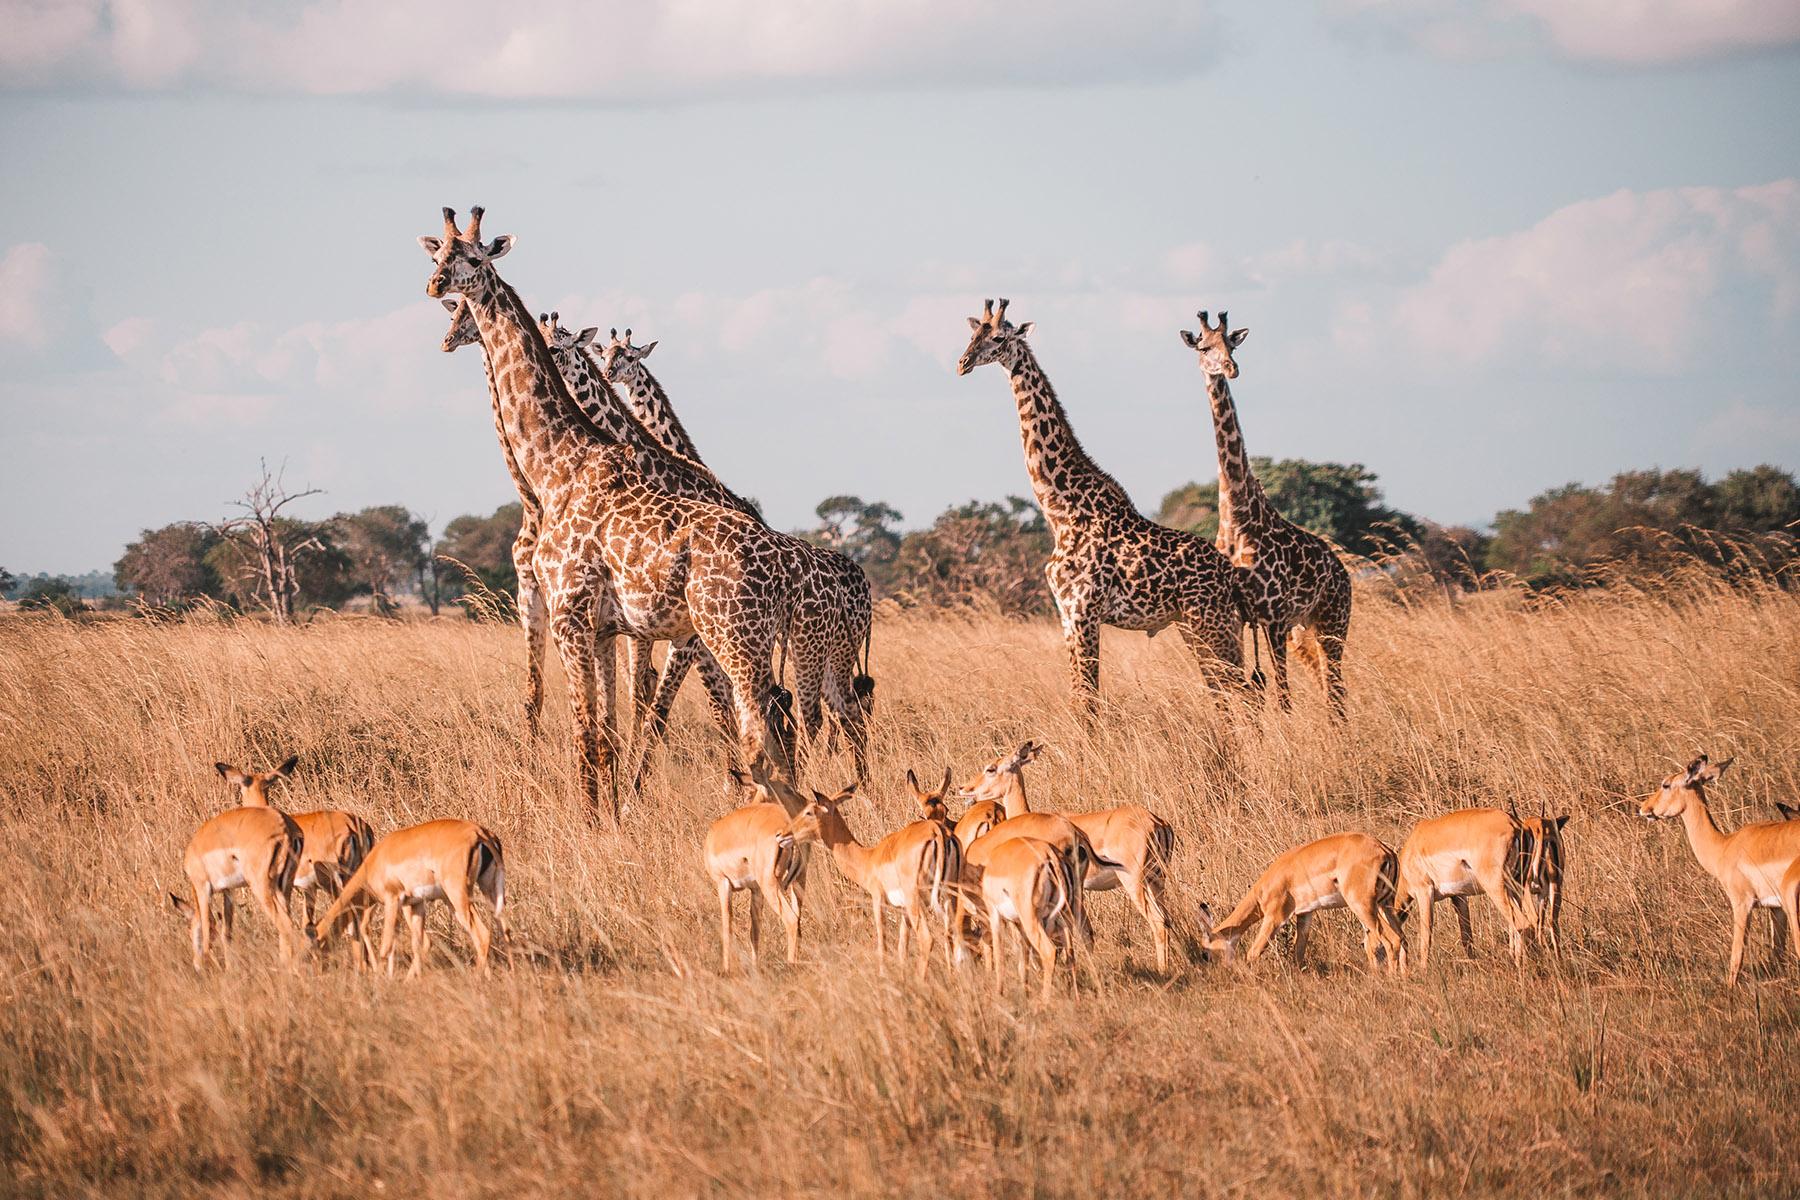 Safari in Mikumi National Park, Tanzania